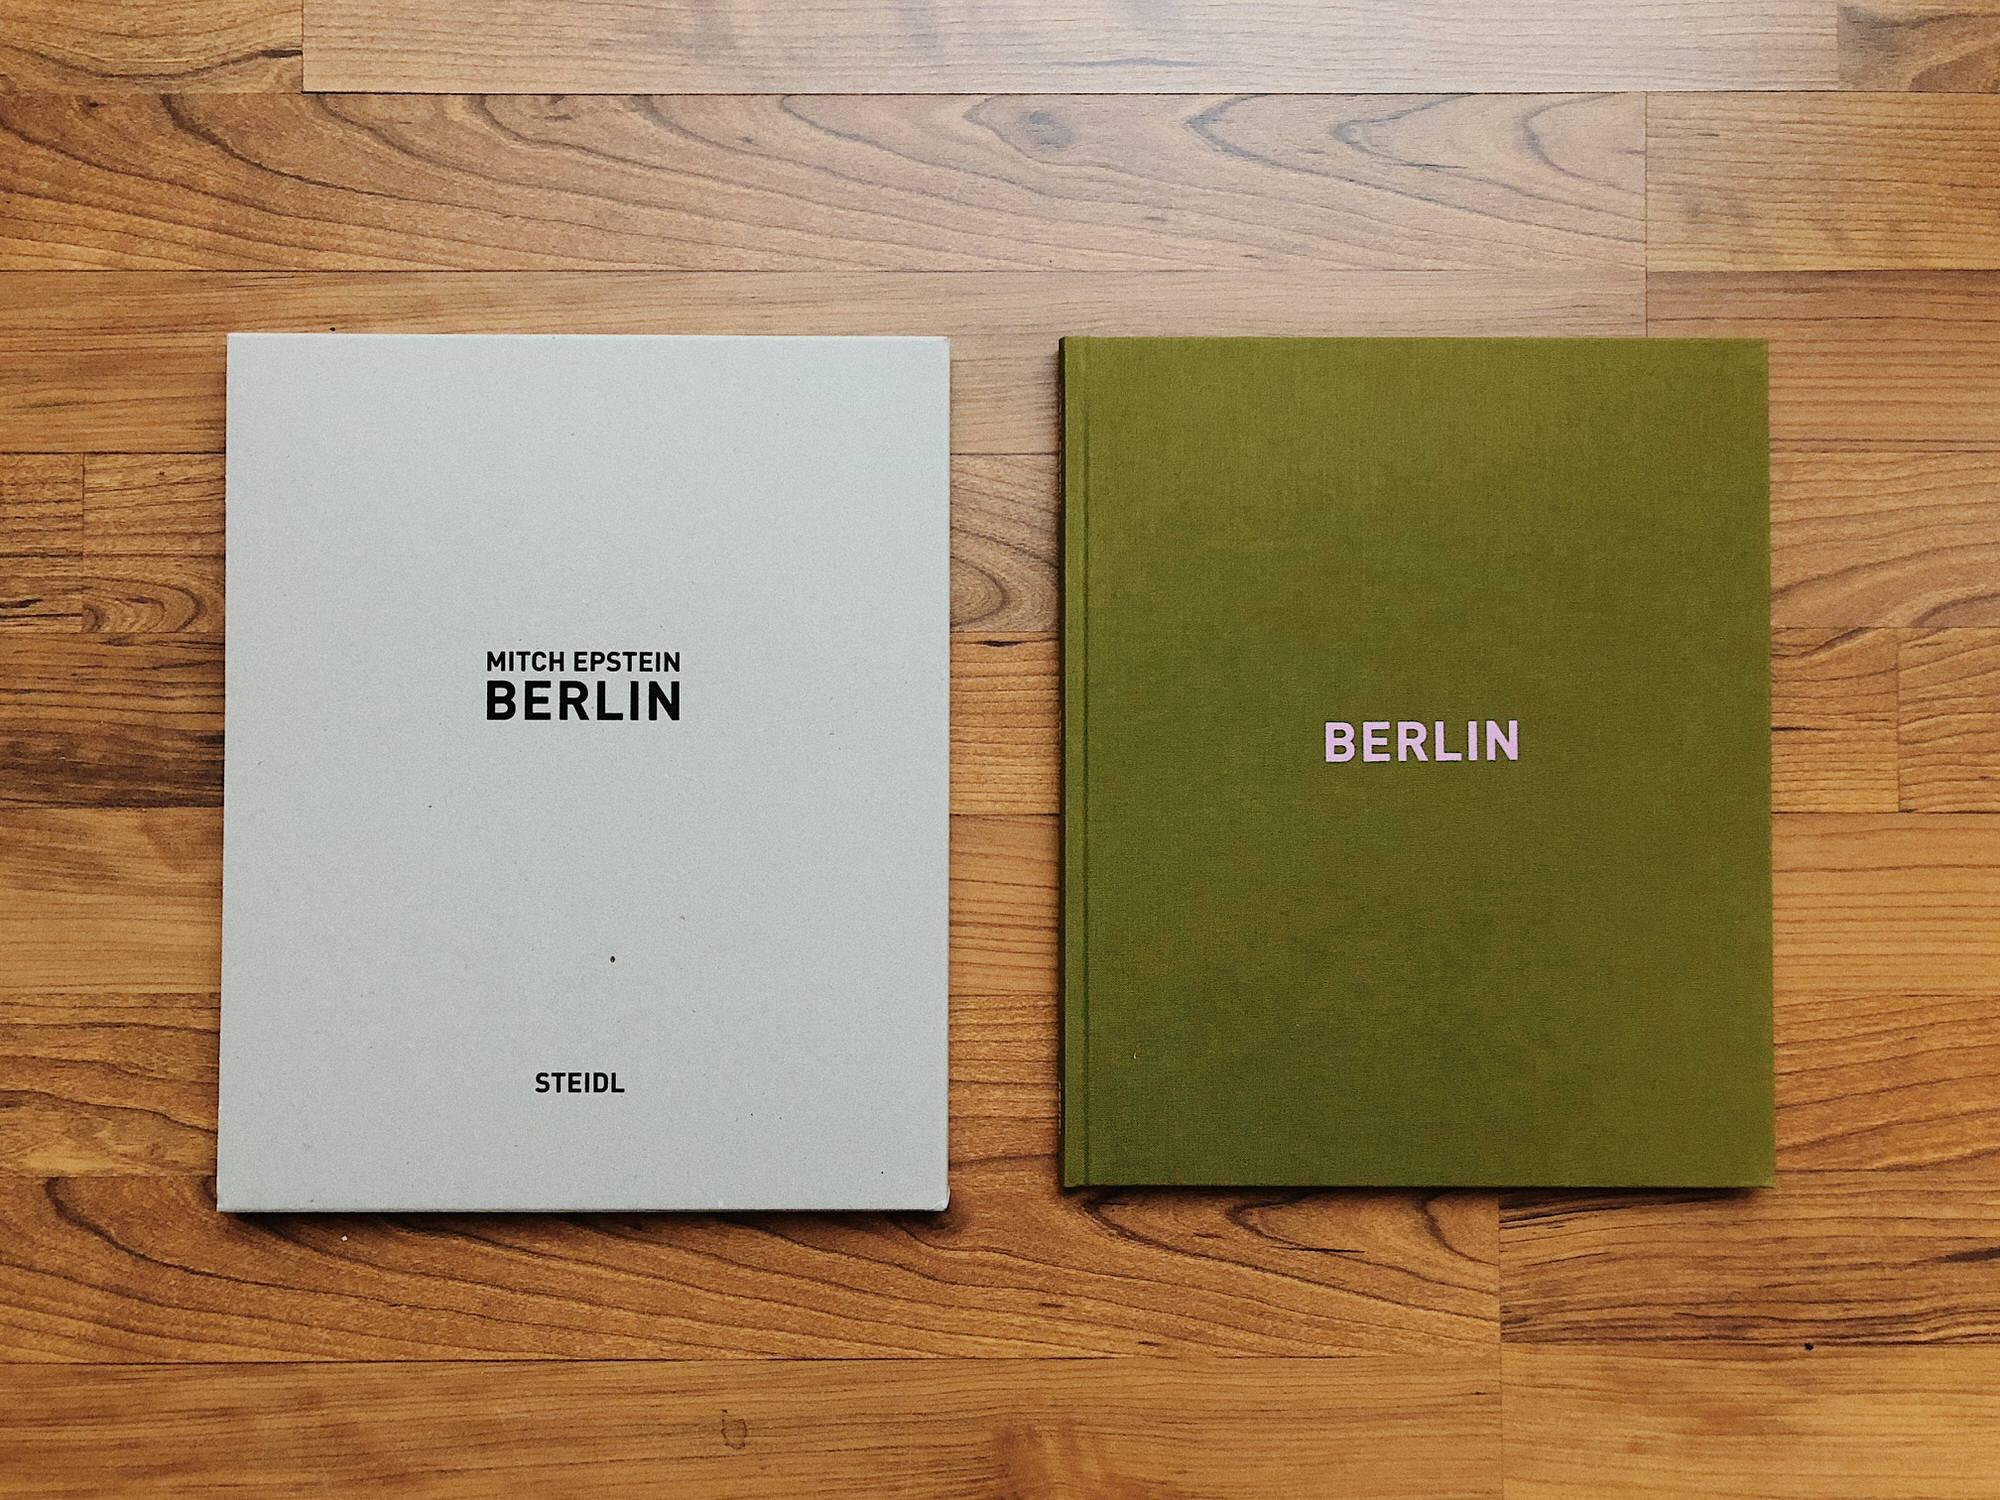 Mitch Epstein Berlin in Cardboard Sleeve